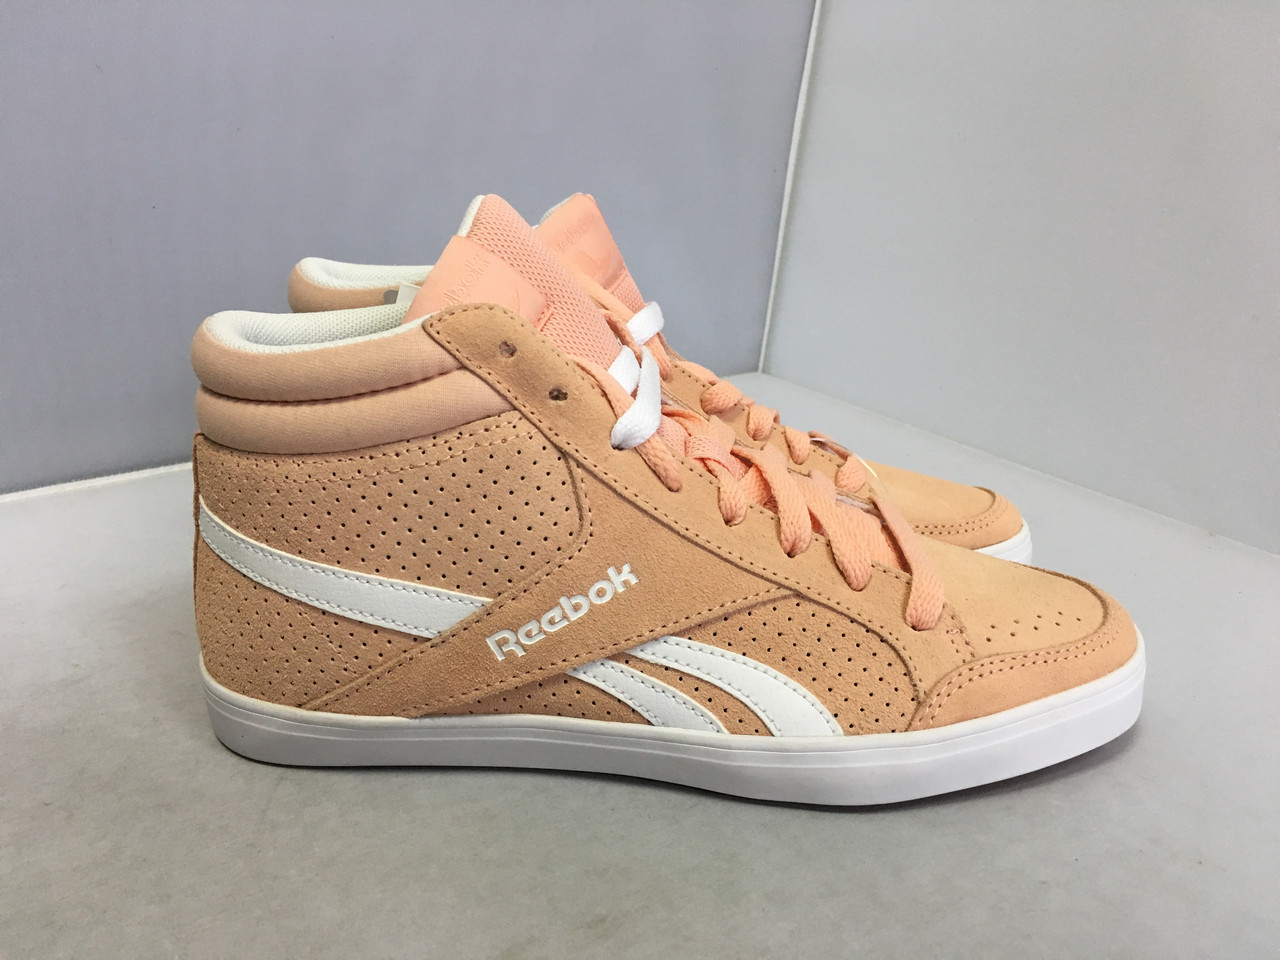 Женские ботинки Reebok, 37,5 размер